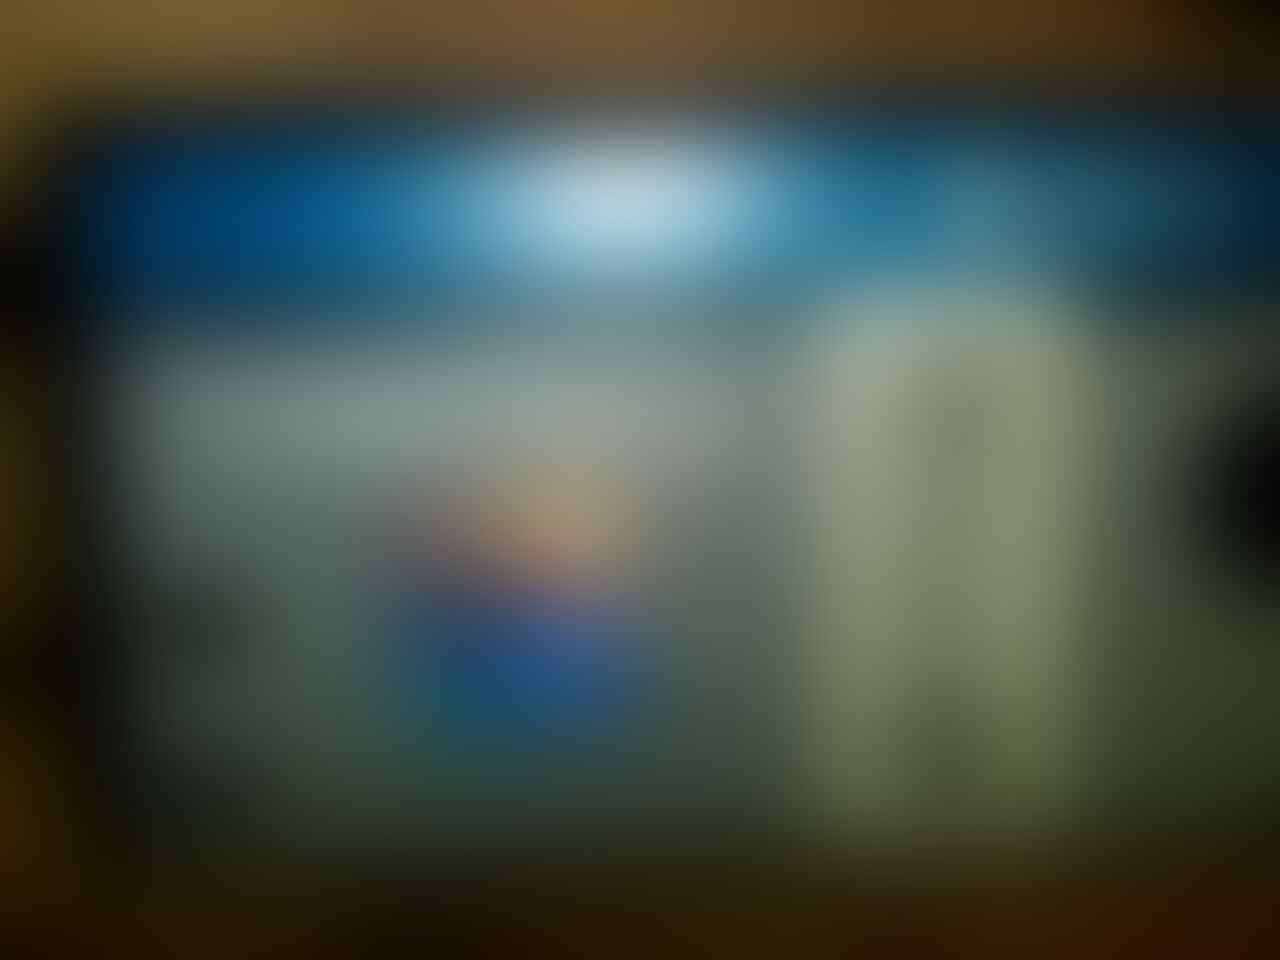 baterai batre 2nd original 100% ctn cs 2 gemini aries kepler jogja